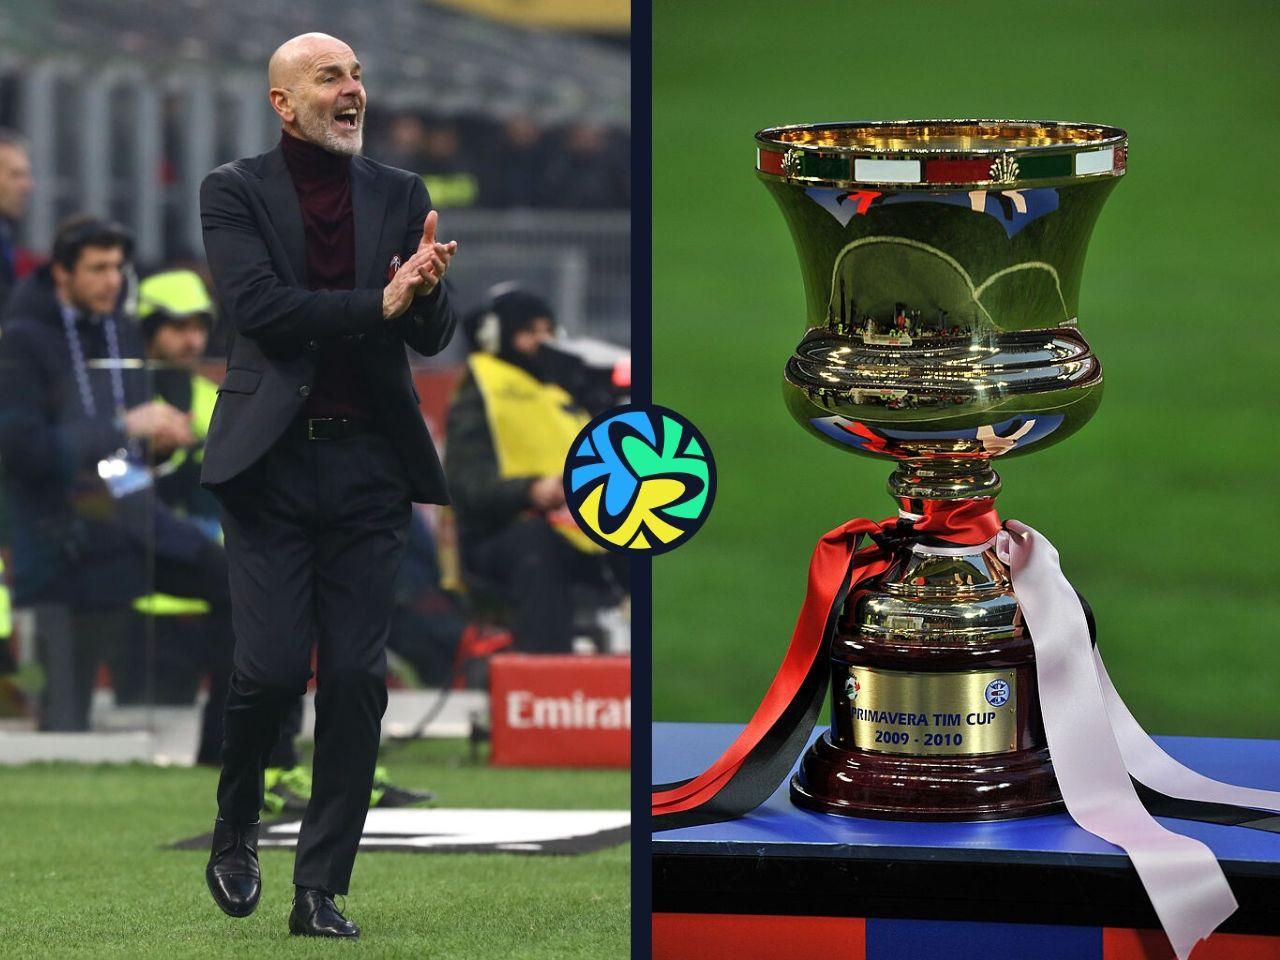 Stefano Pioli, Coppa Italia, AC Milan